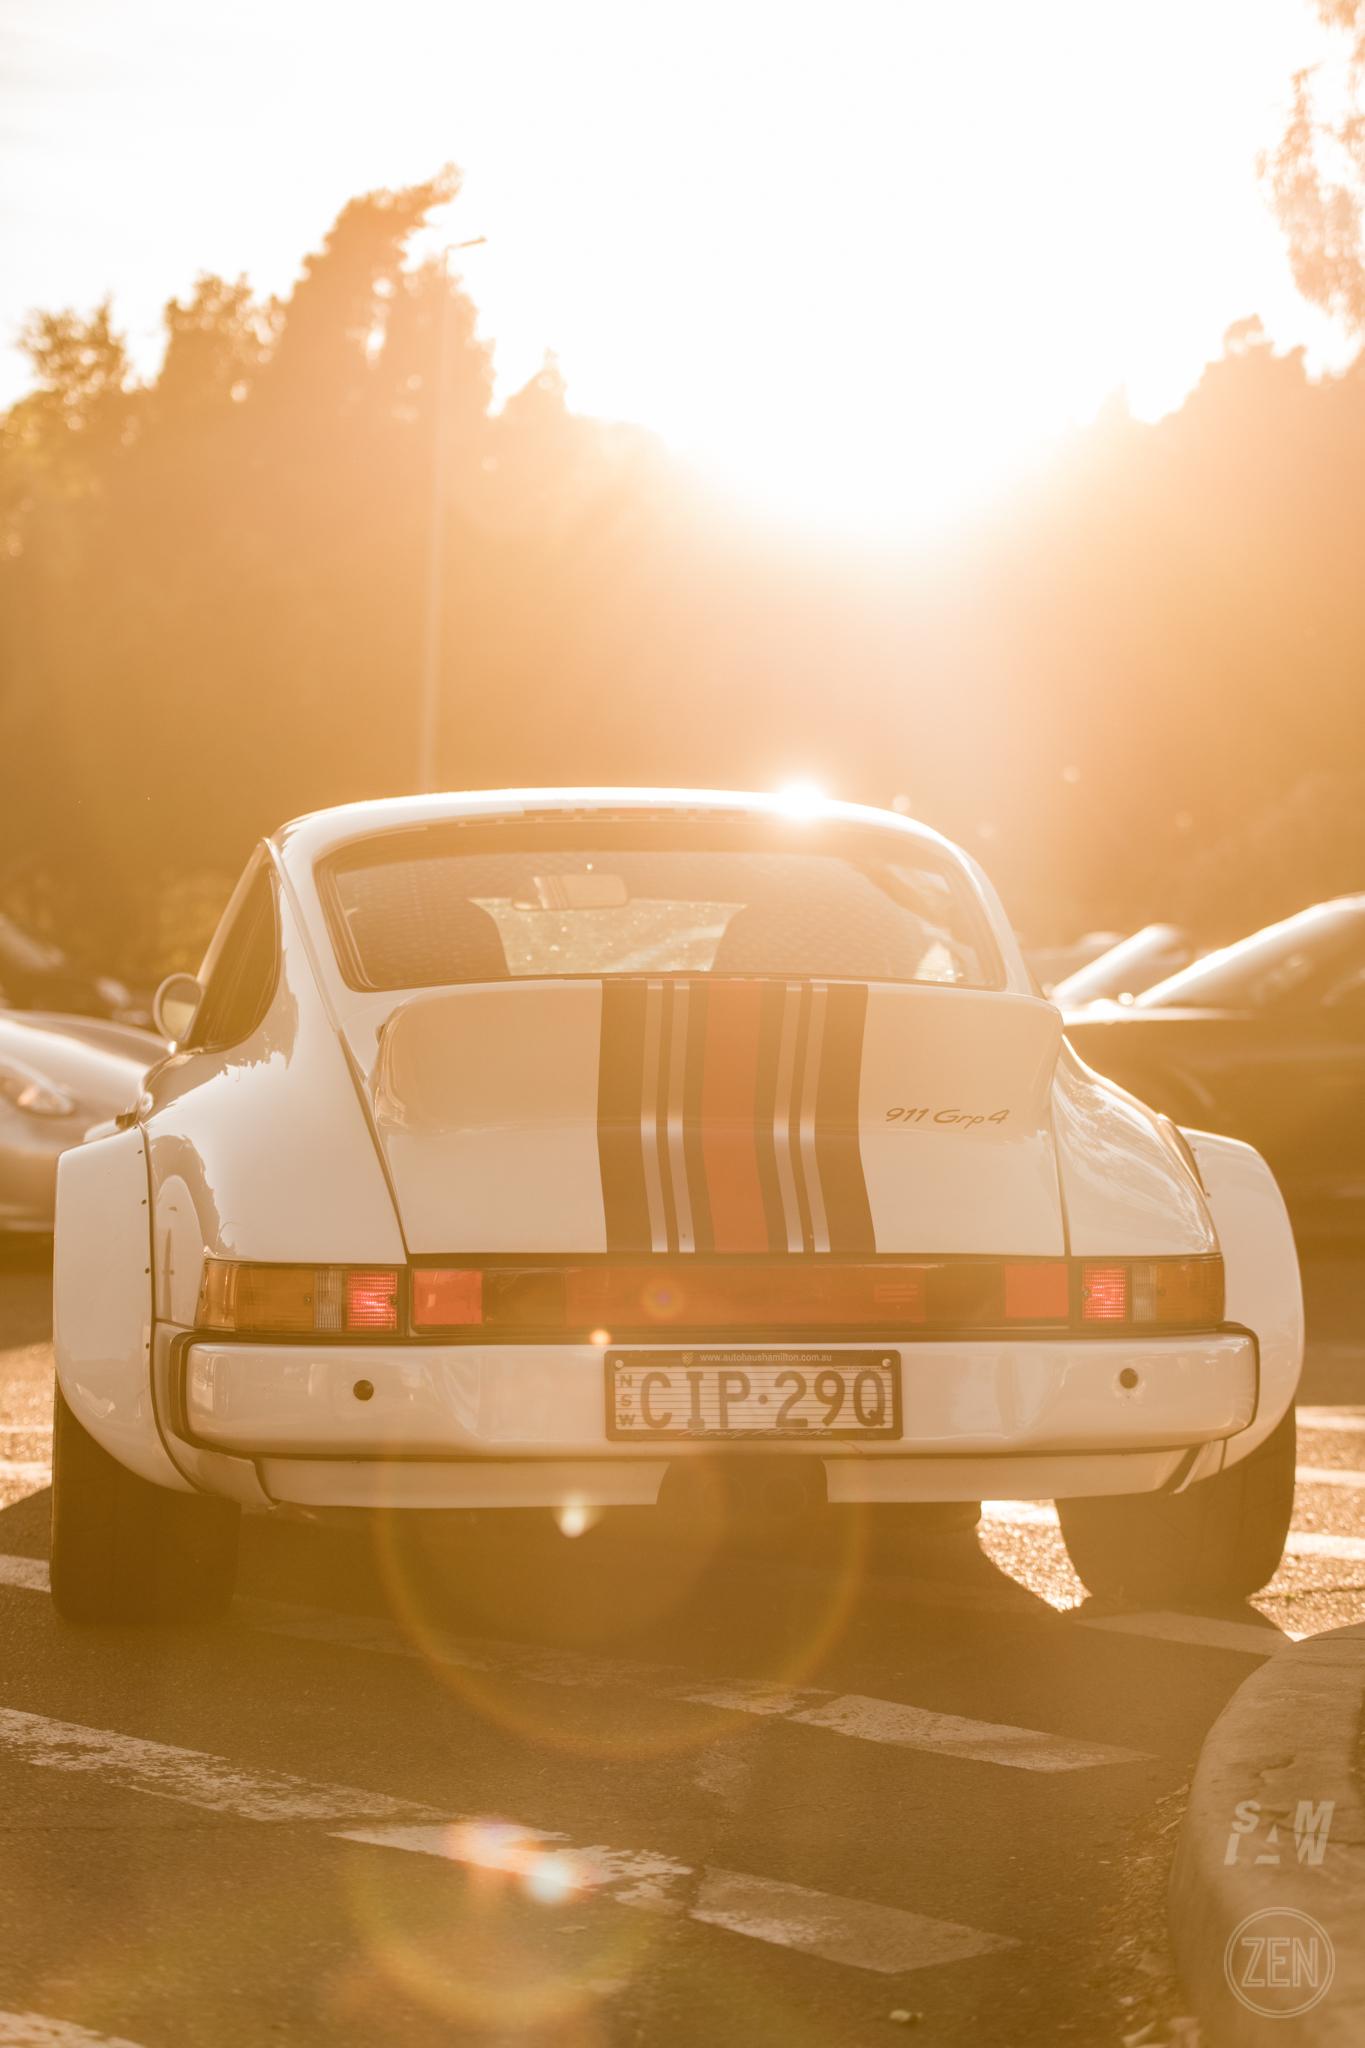 2019-10-27 - Autohaus Porsches & Coffee 036